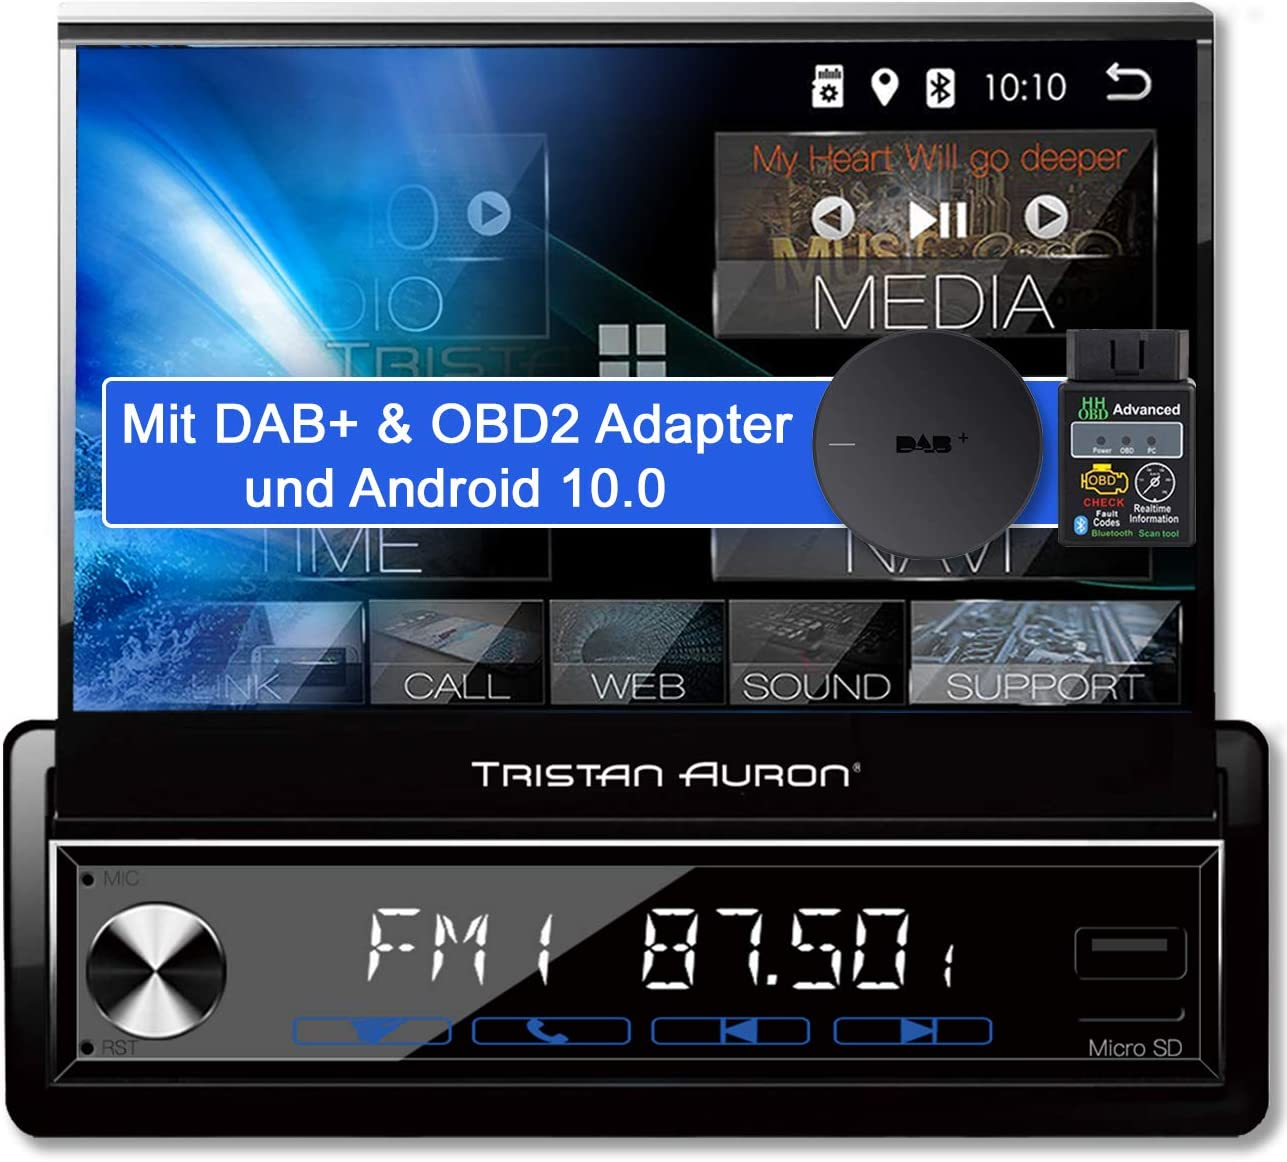 Tristan Auron Bt1d7027a Android 10 0 Car Radio 32 Gb Elektronik